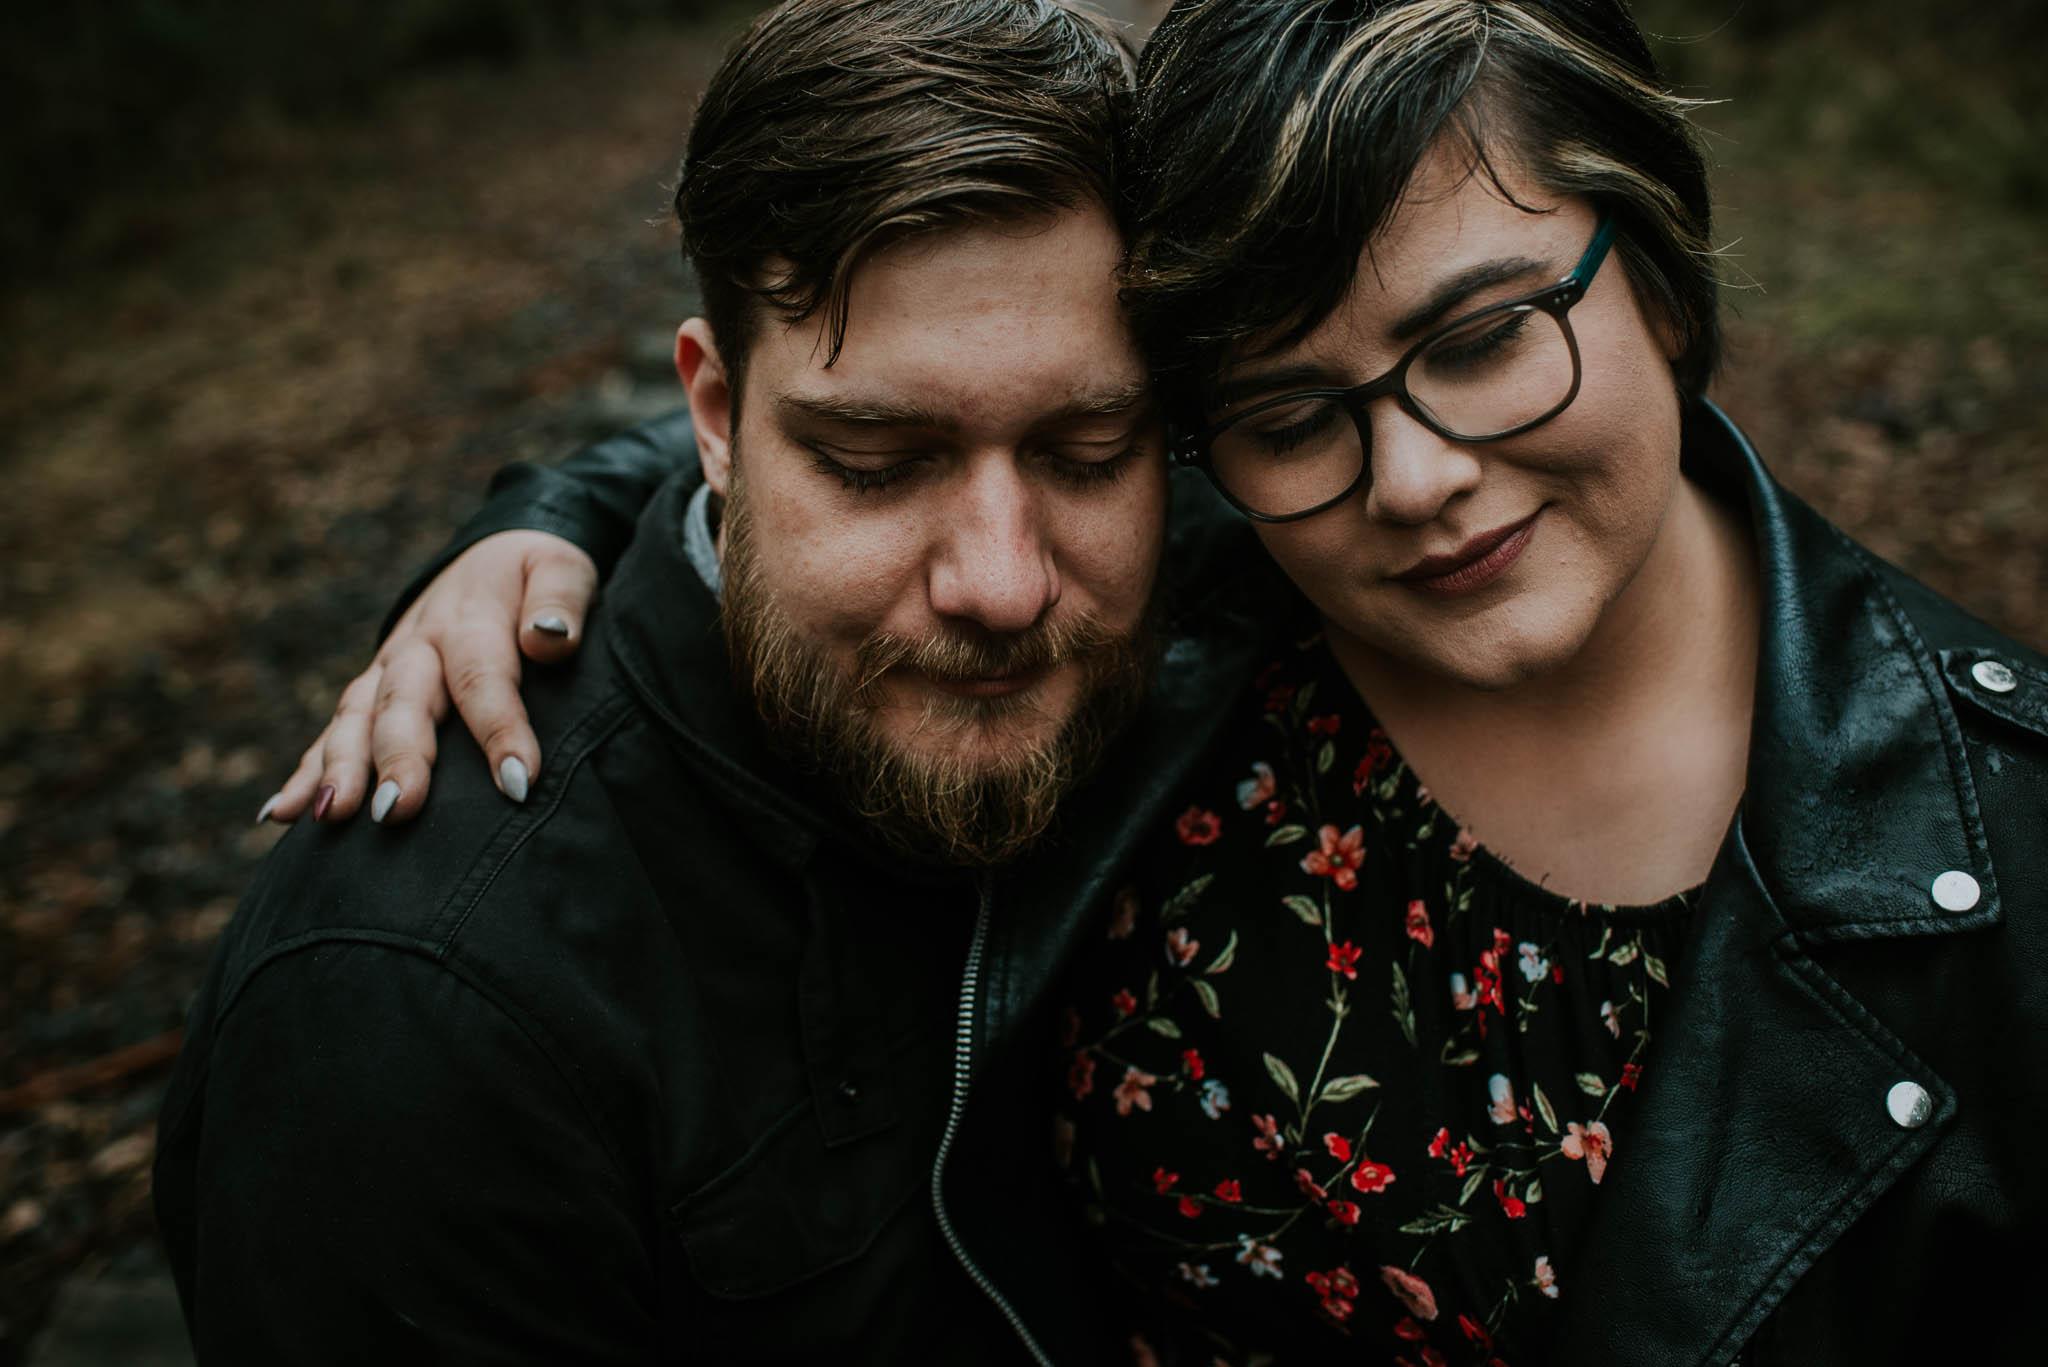 launceston couples photographer-9.jpg